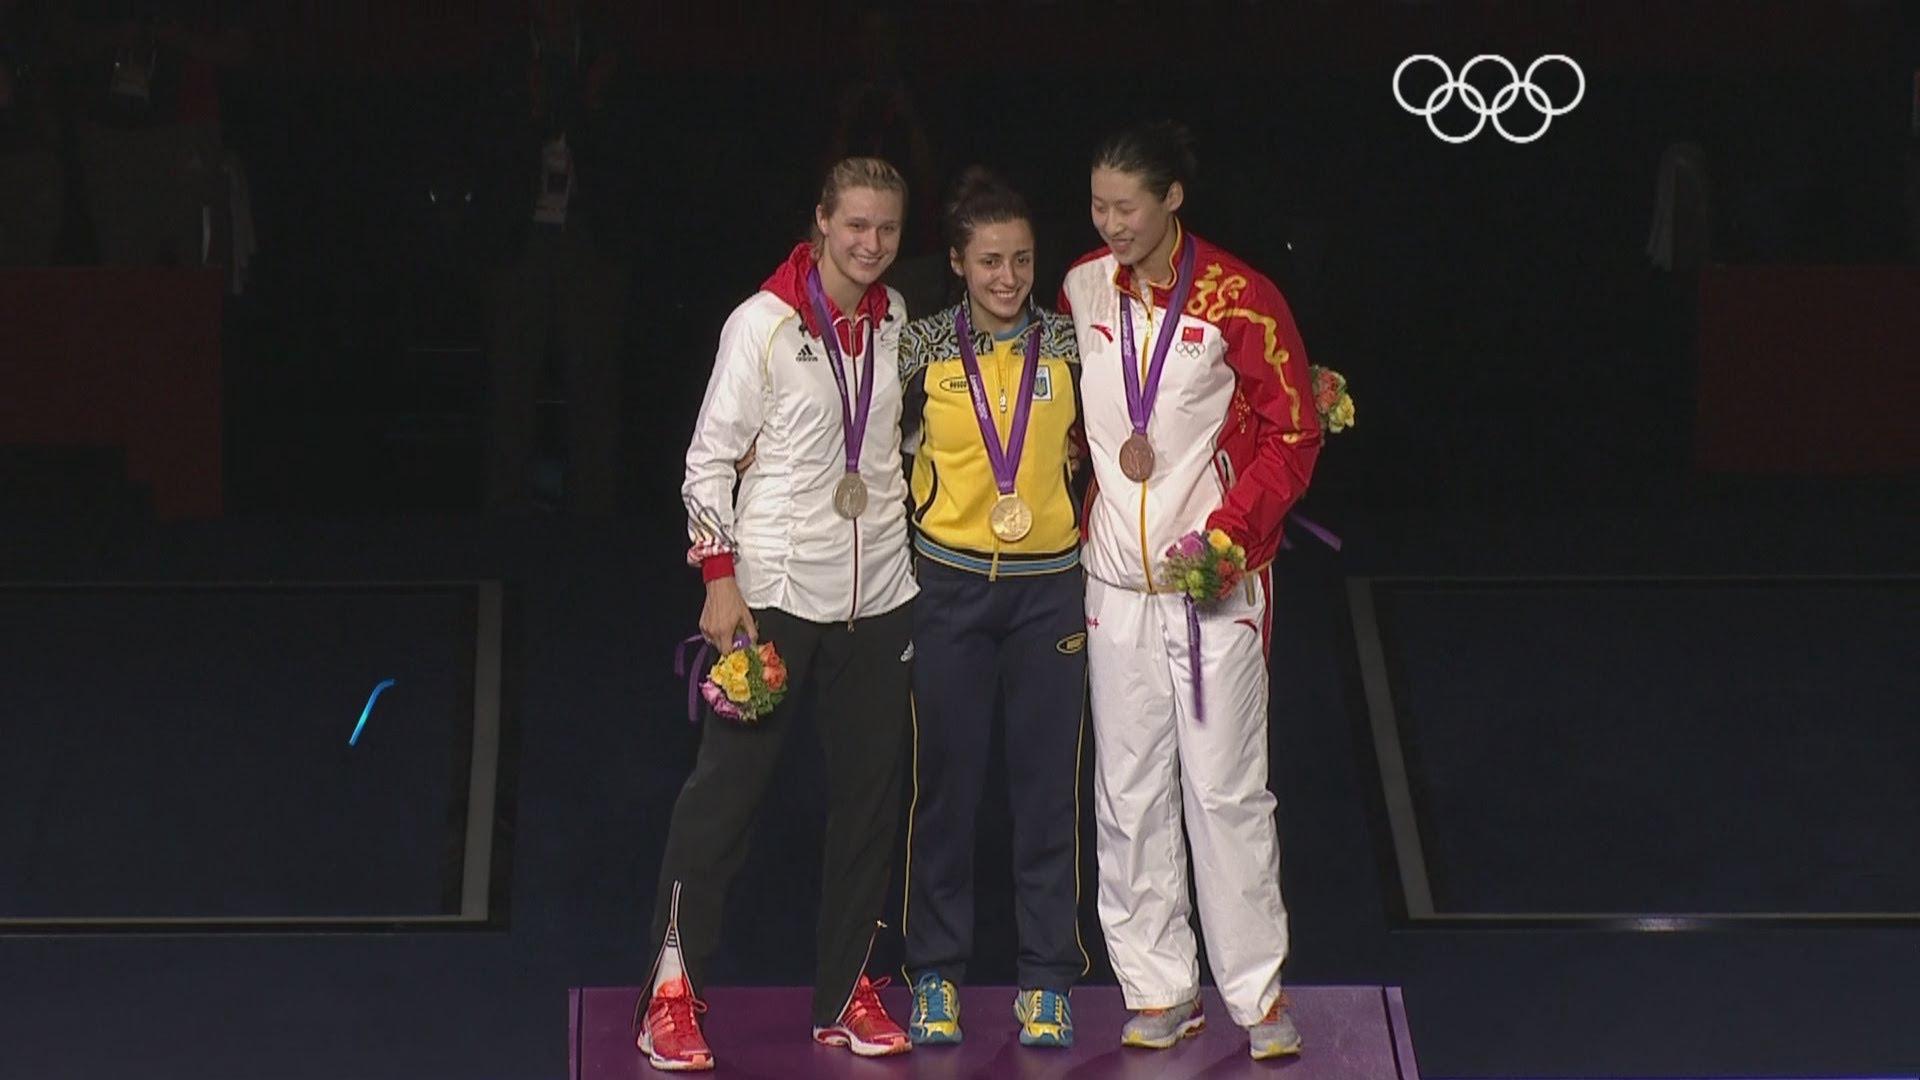 podio londra 2012 spada donne